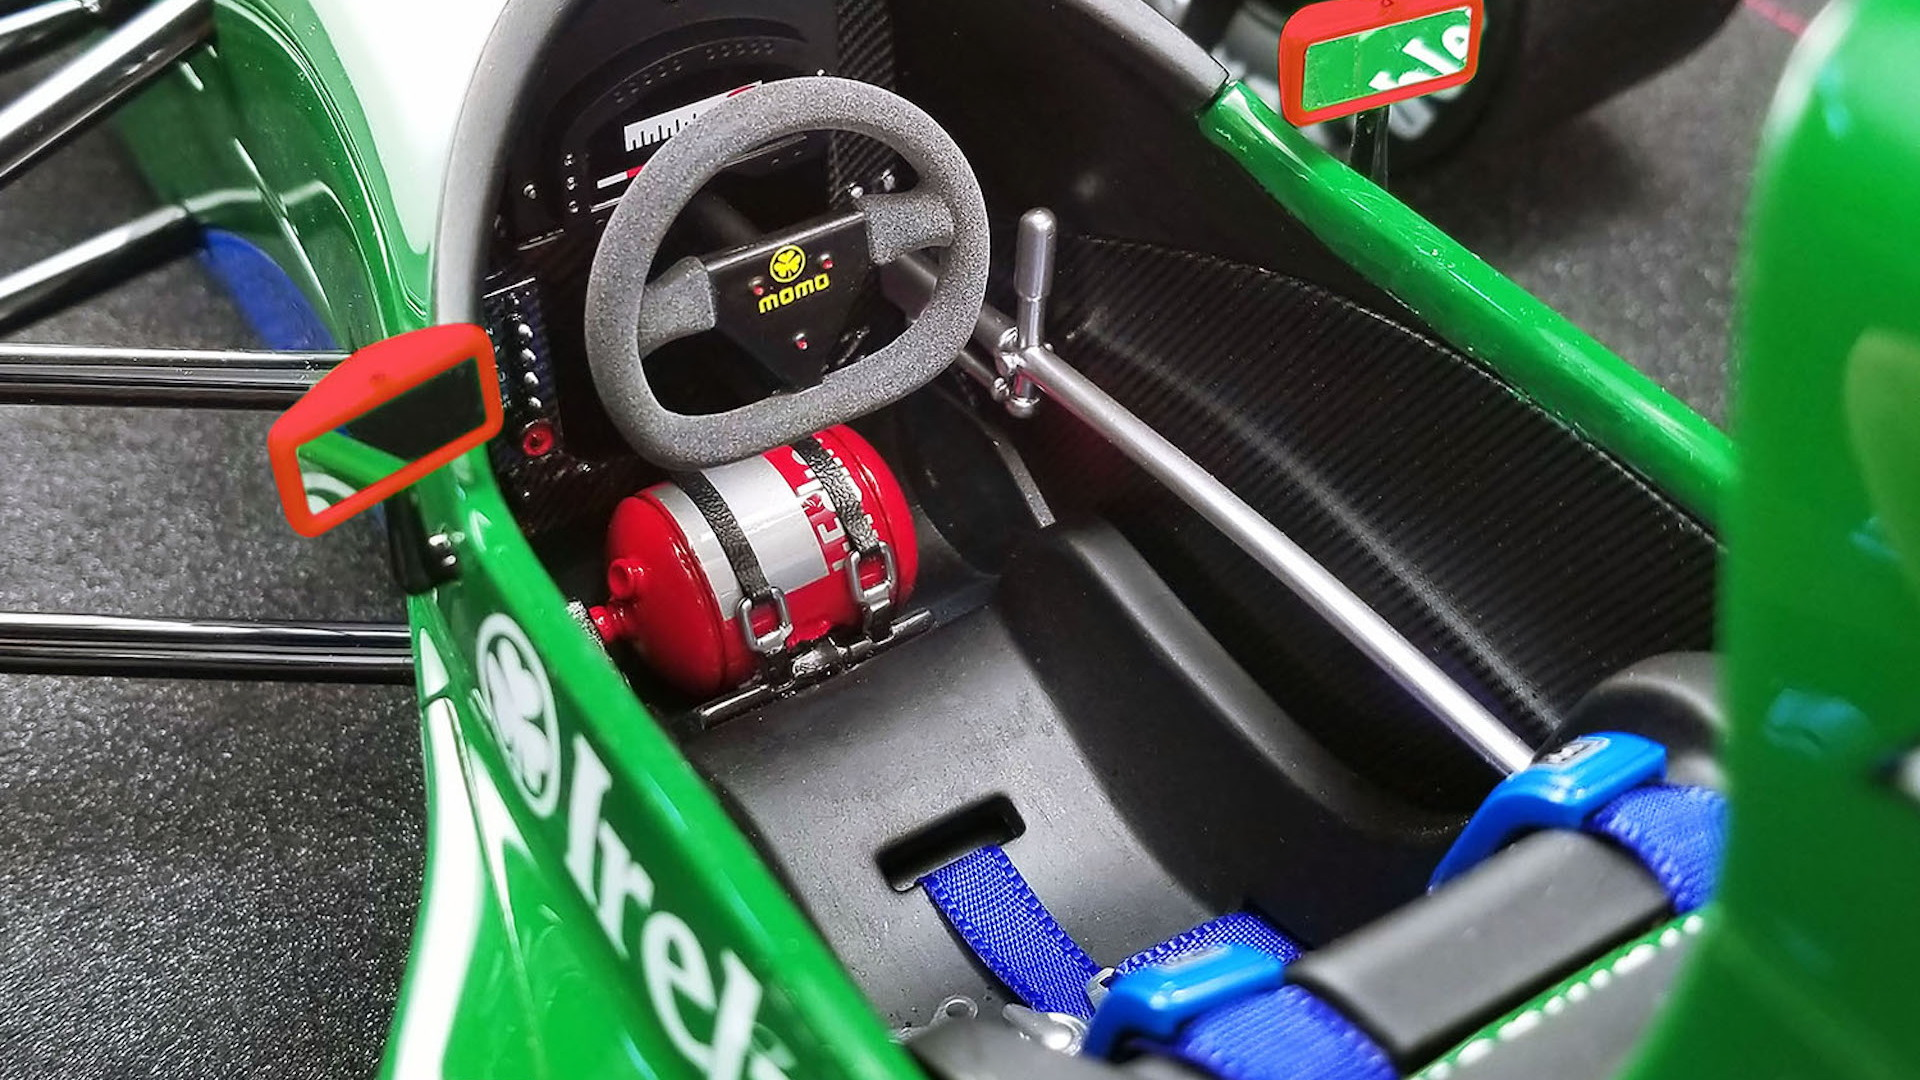 Model of Michael Schumacher's 1991 Jordan F1 car